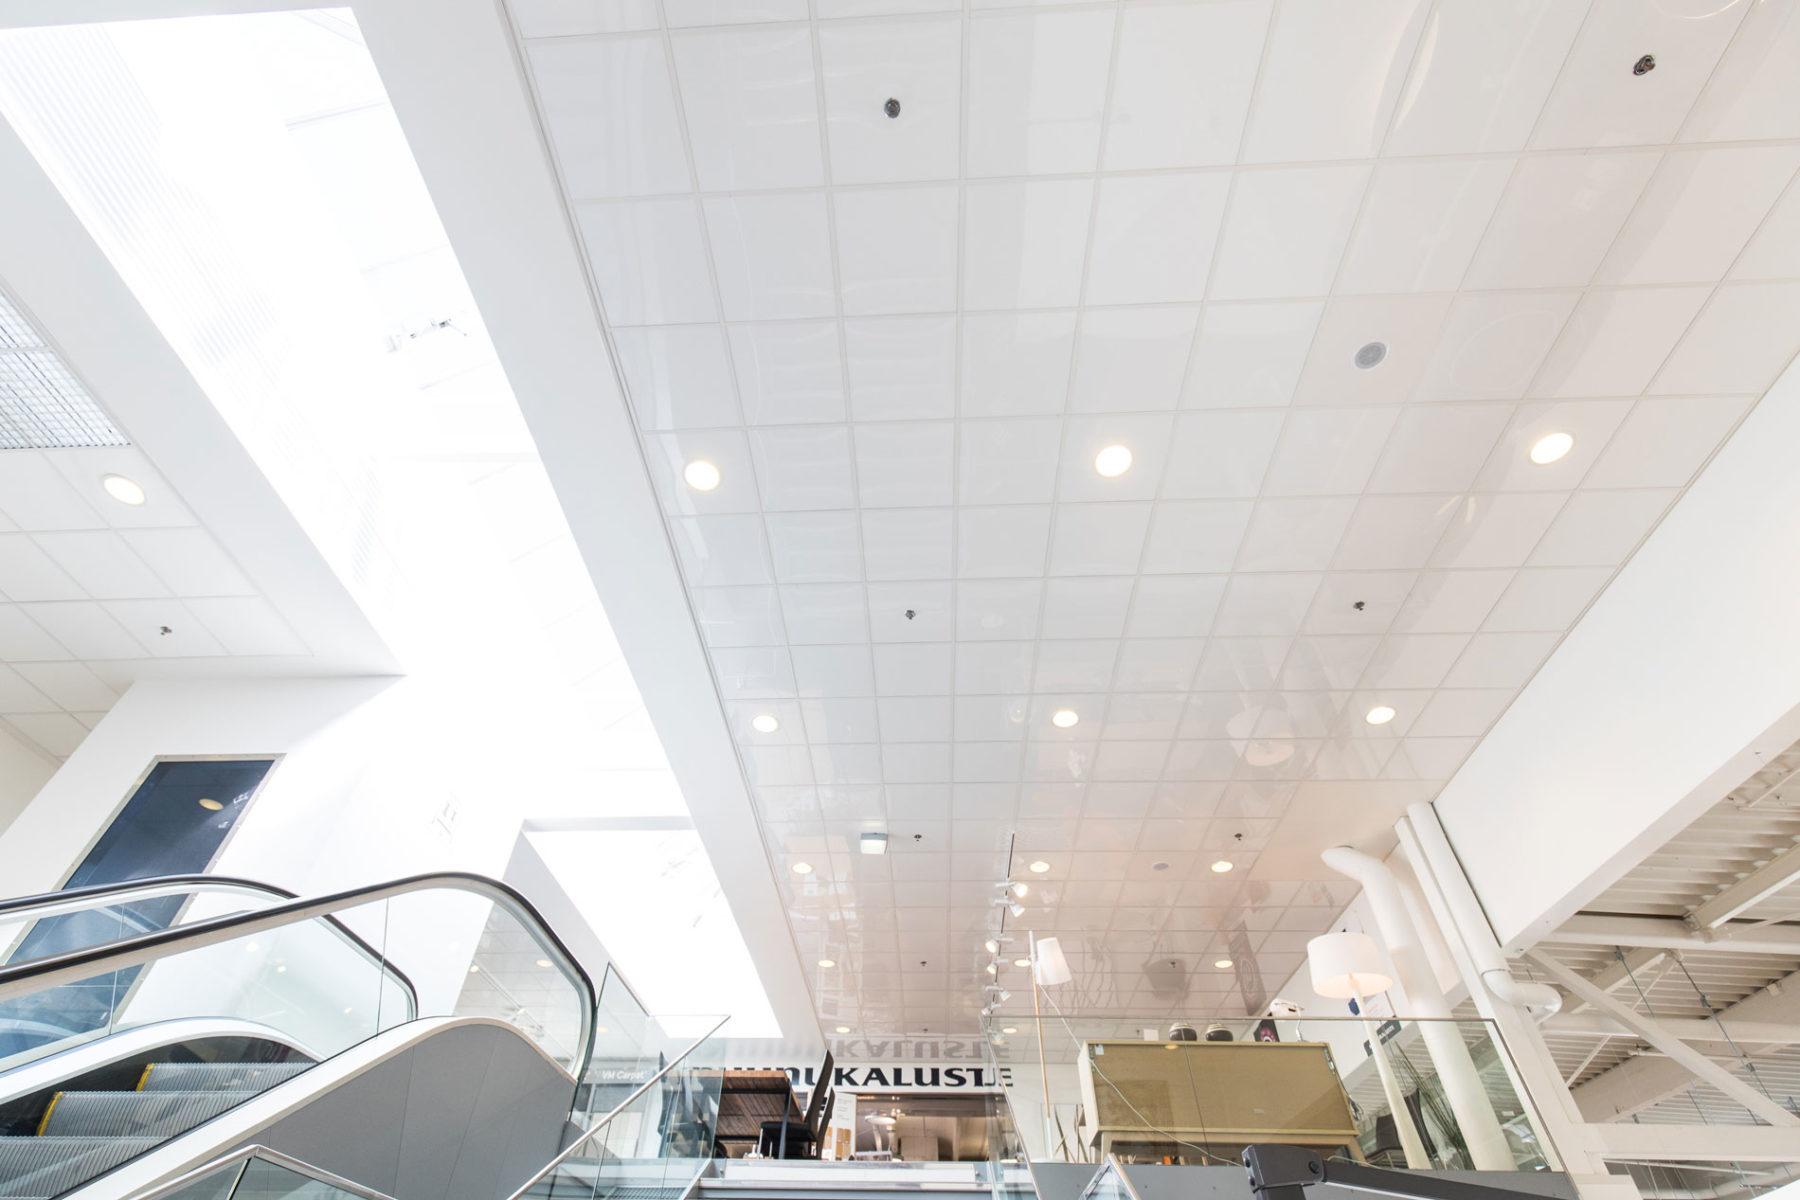 Kruunukaluste-DPS-katto2